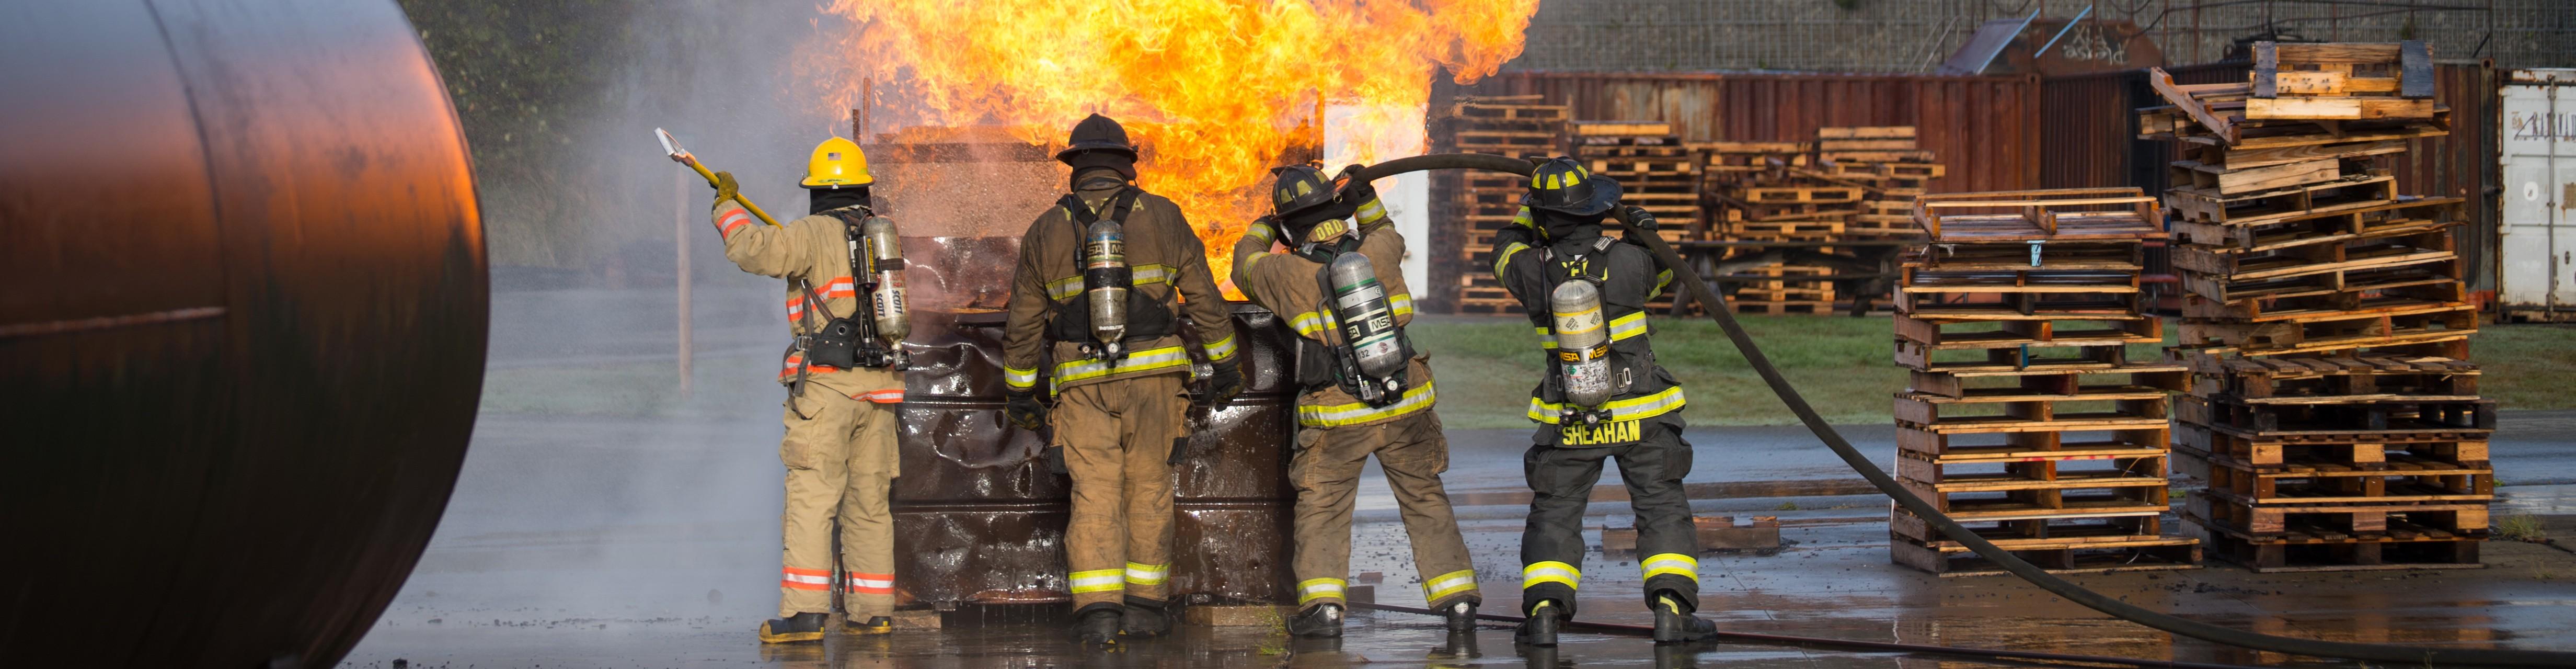 Fire Service Certification Wsp